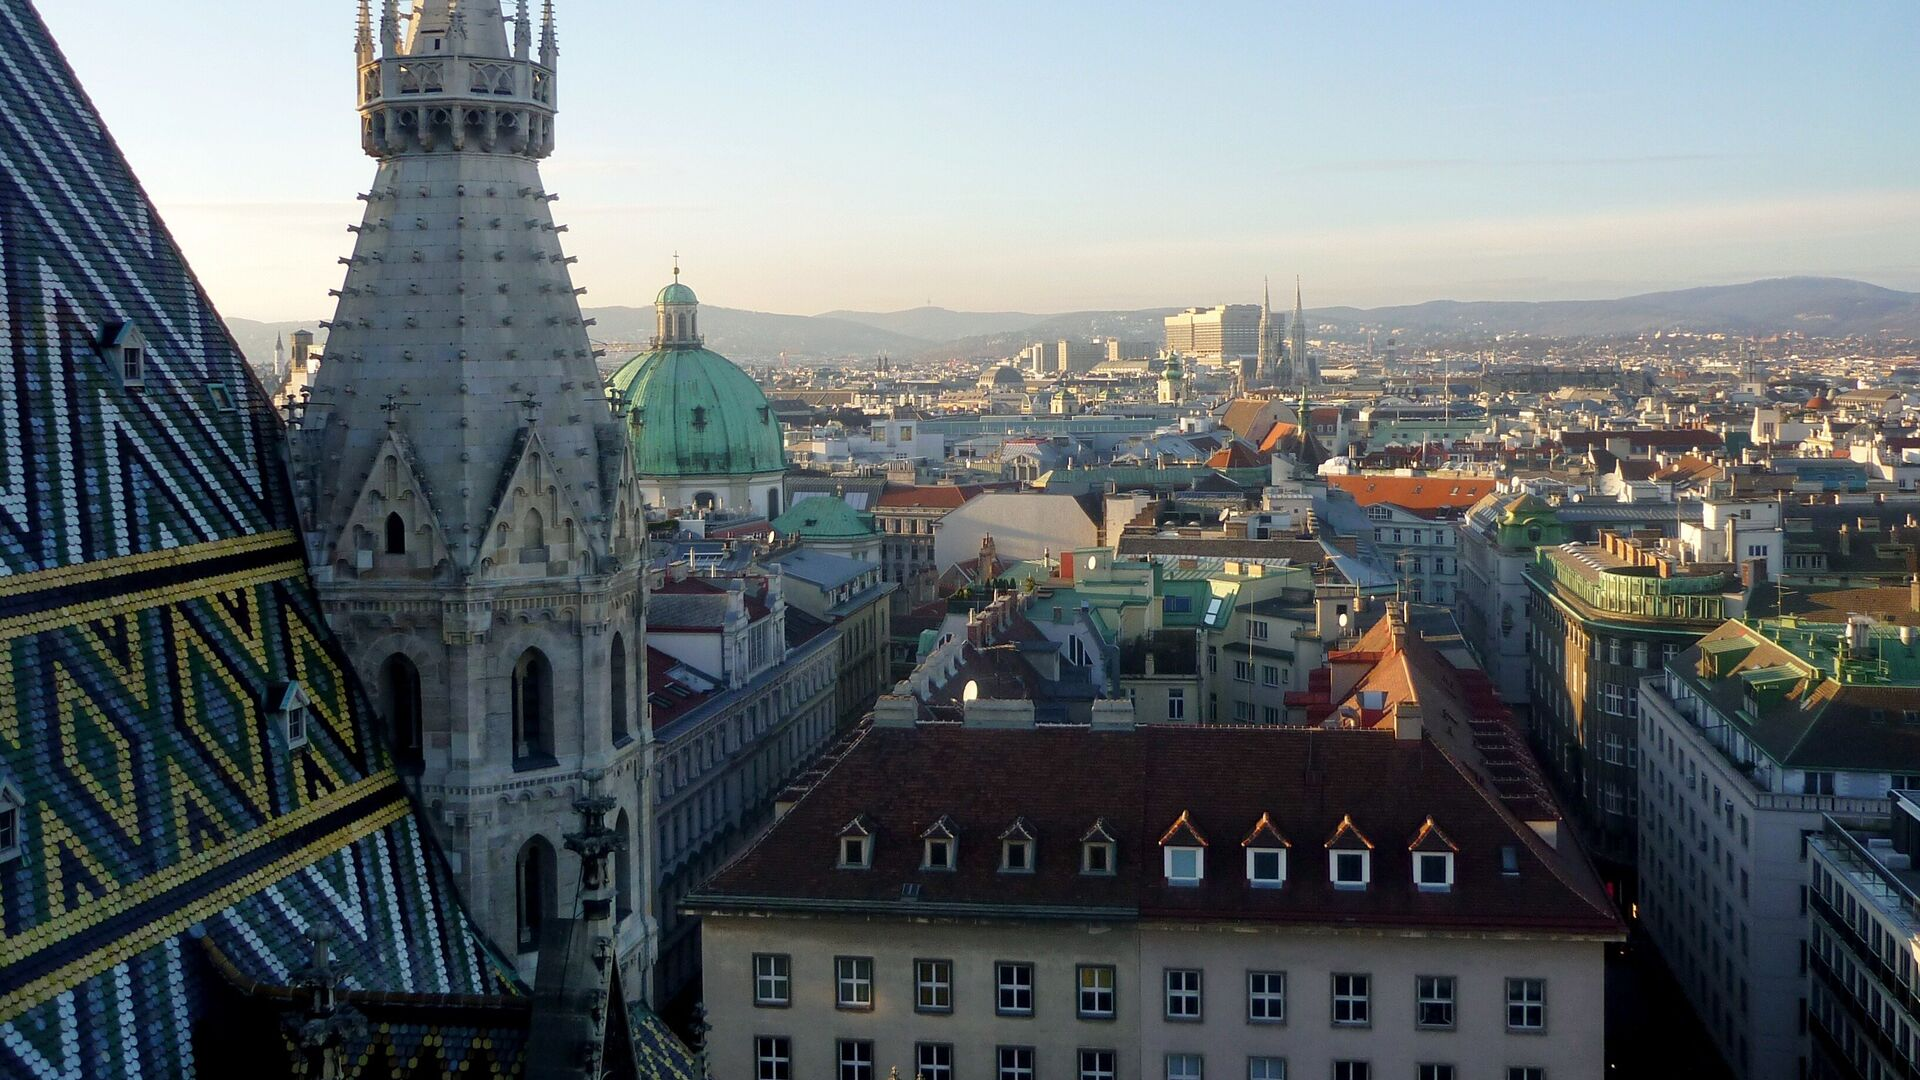 Viena, la capital de Austria - Sputnik Mundo, 1920, 20.06.2021